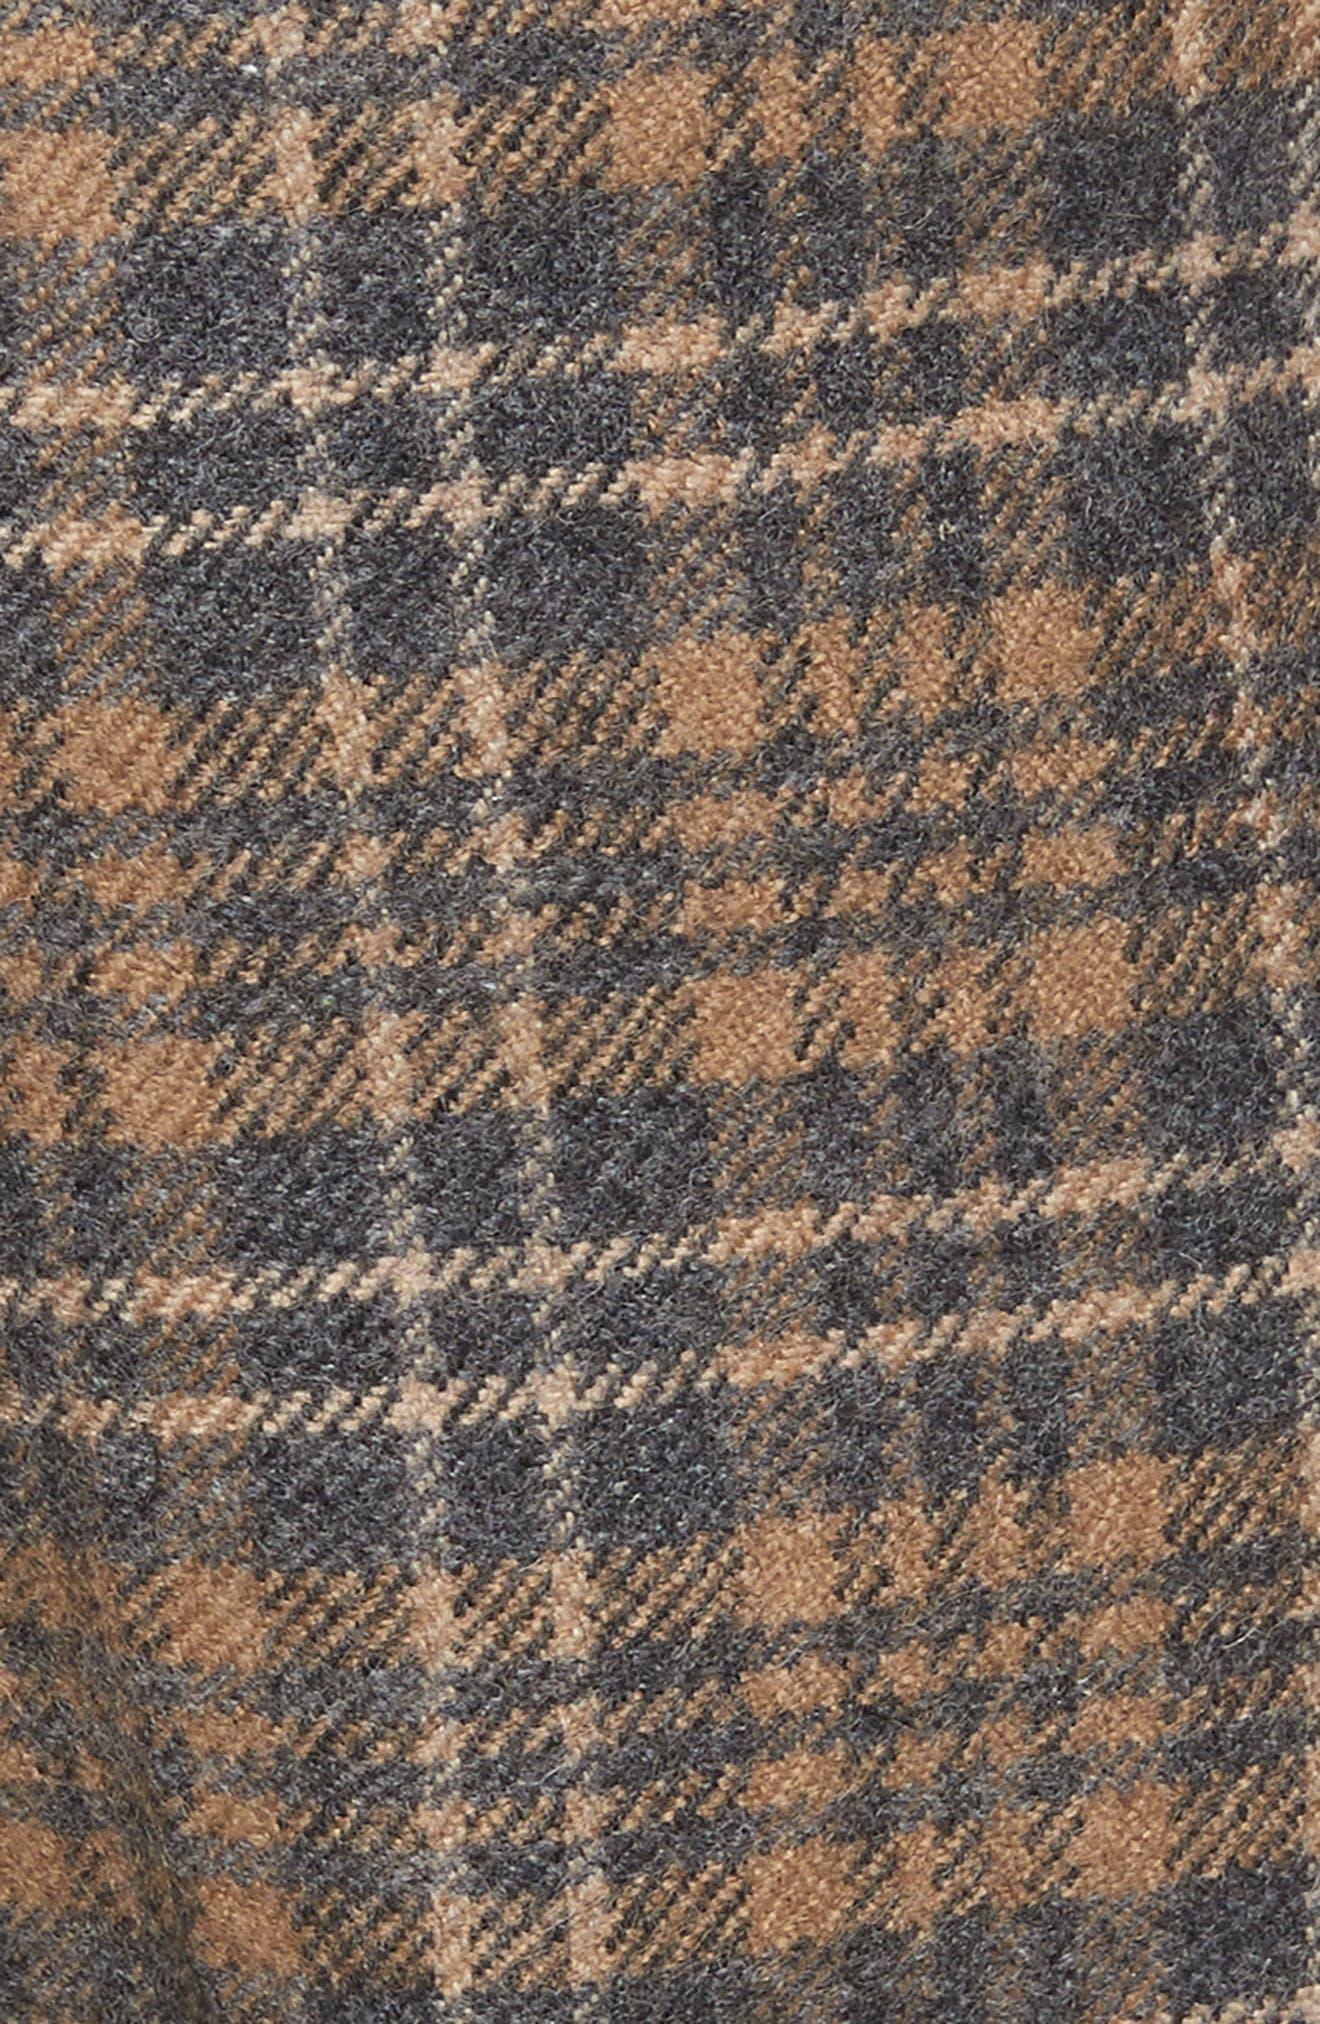 Plaid Wool Blend Wide Leg Pants,                             Alternate thumbnail 5, color,                             Camel Multi